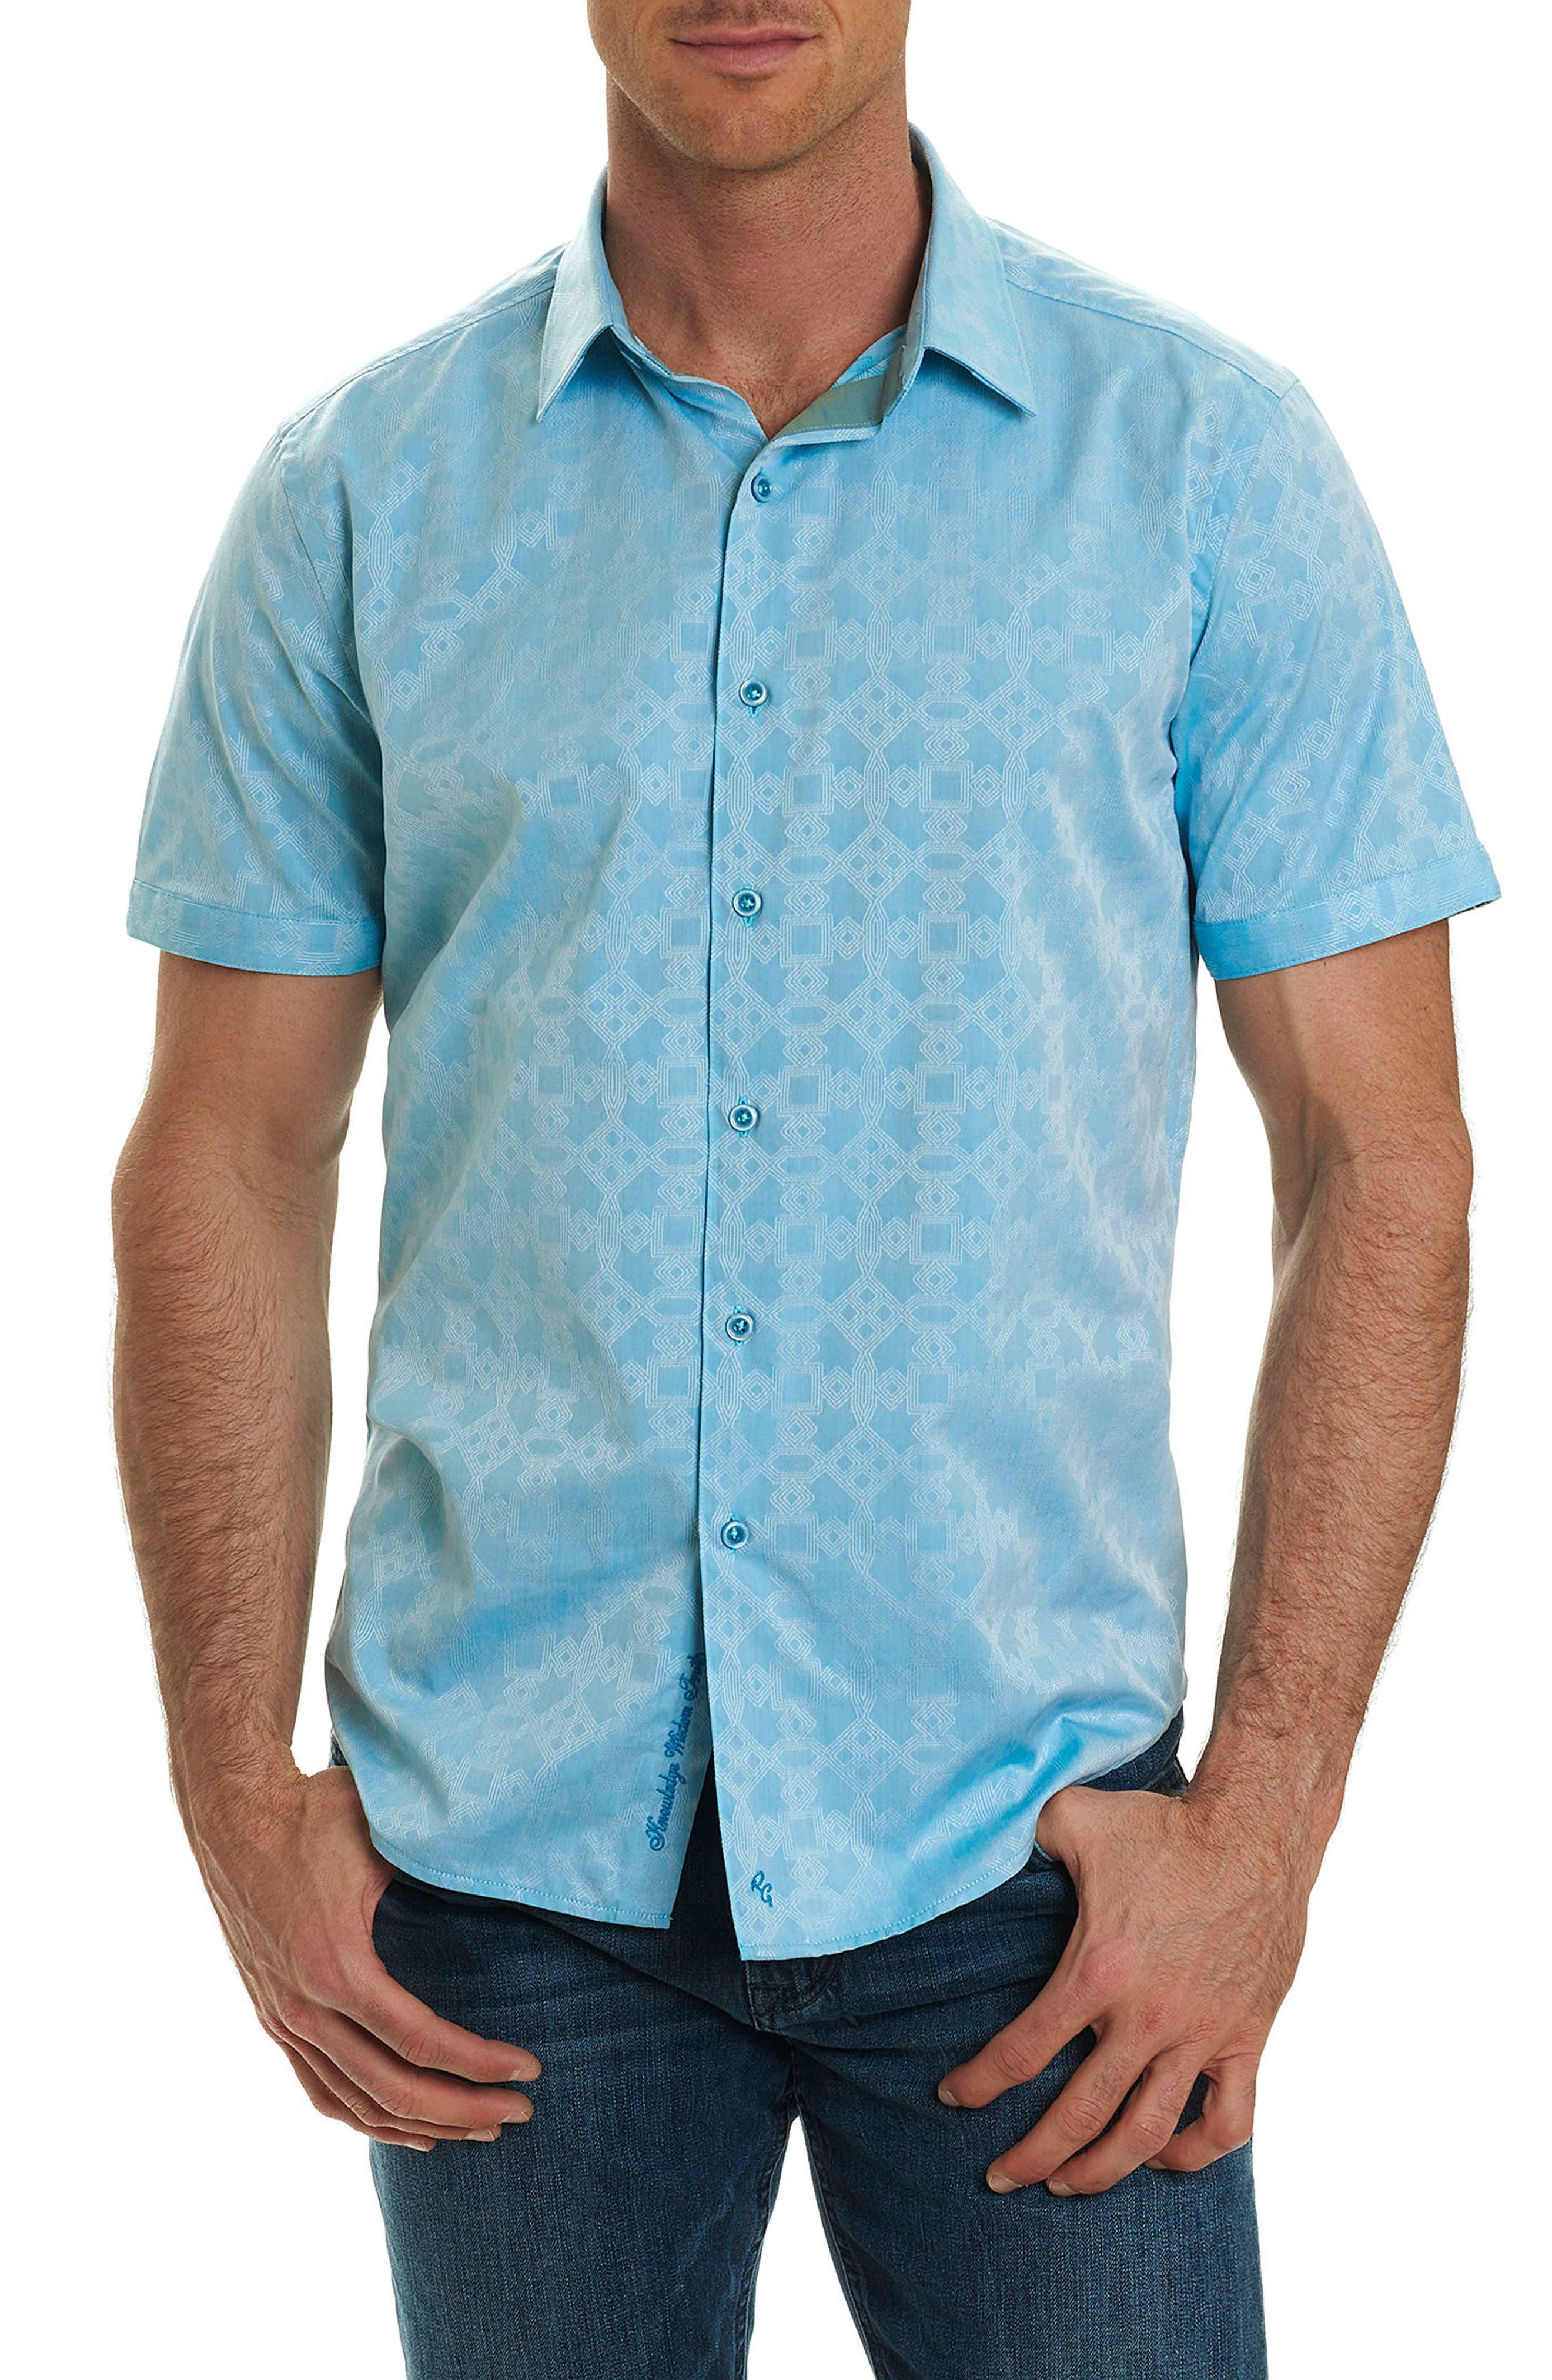 Maya Bay Classic Fit Jacquard Sport Shirt,                             Main thumbnail 1, color,                             Turquoise